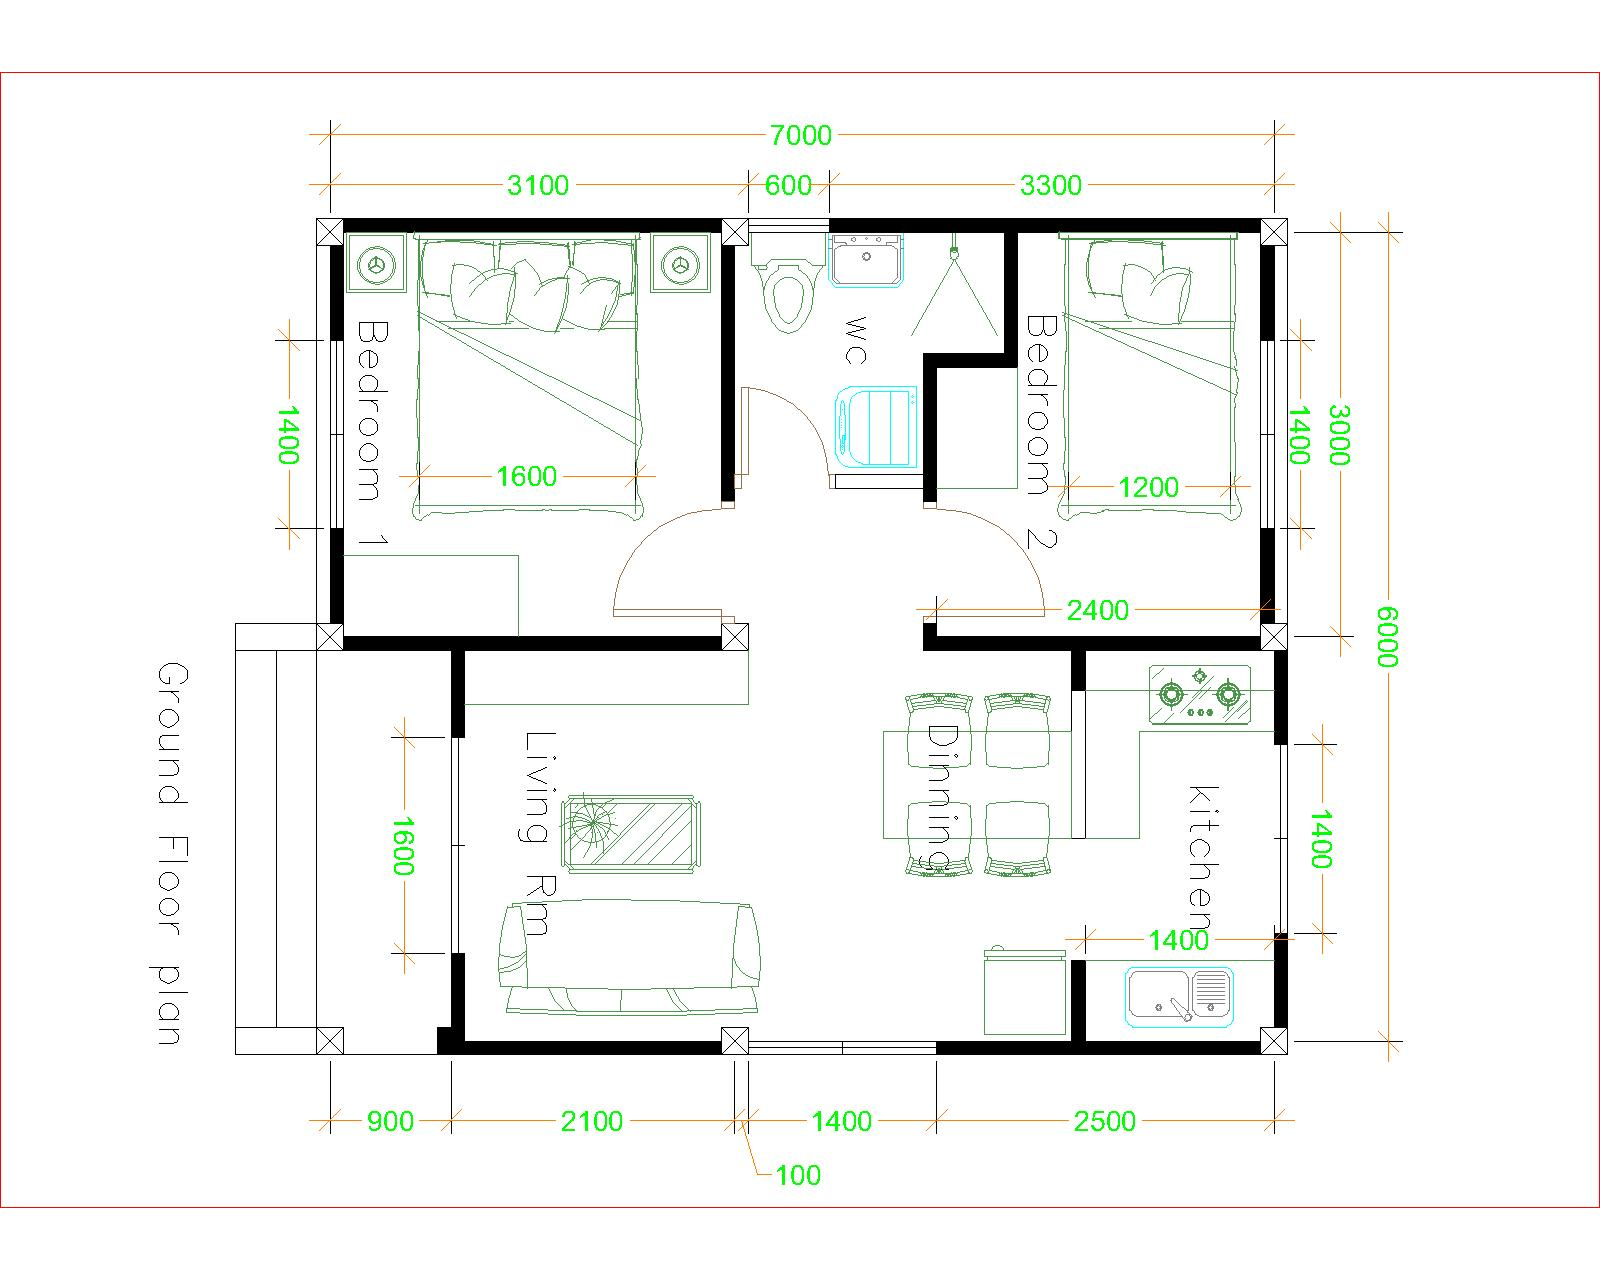 House Plans 6x7m with 2 bedrooms 20x23 Feet Pdf Full Plan floor plan